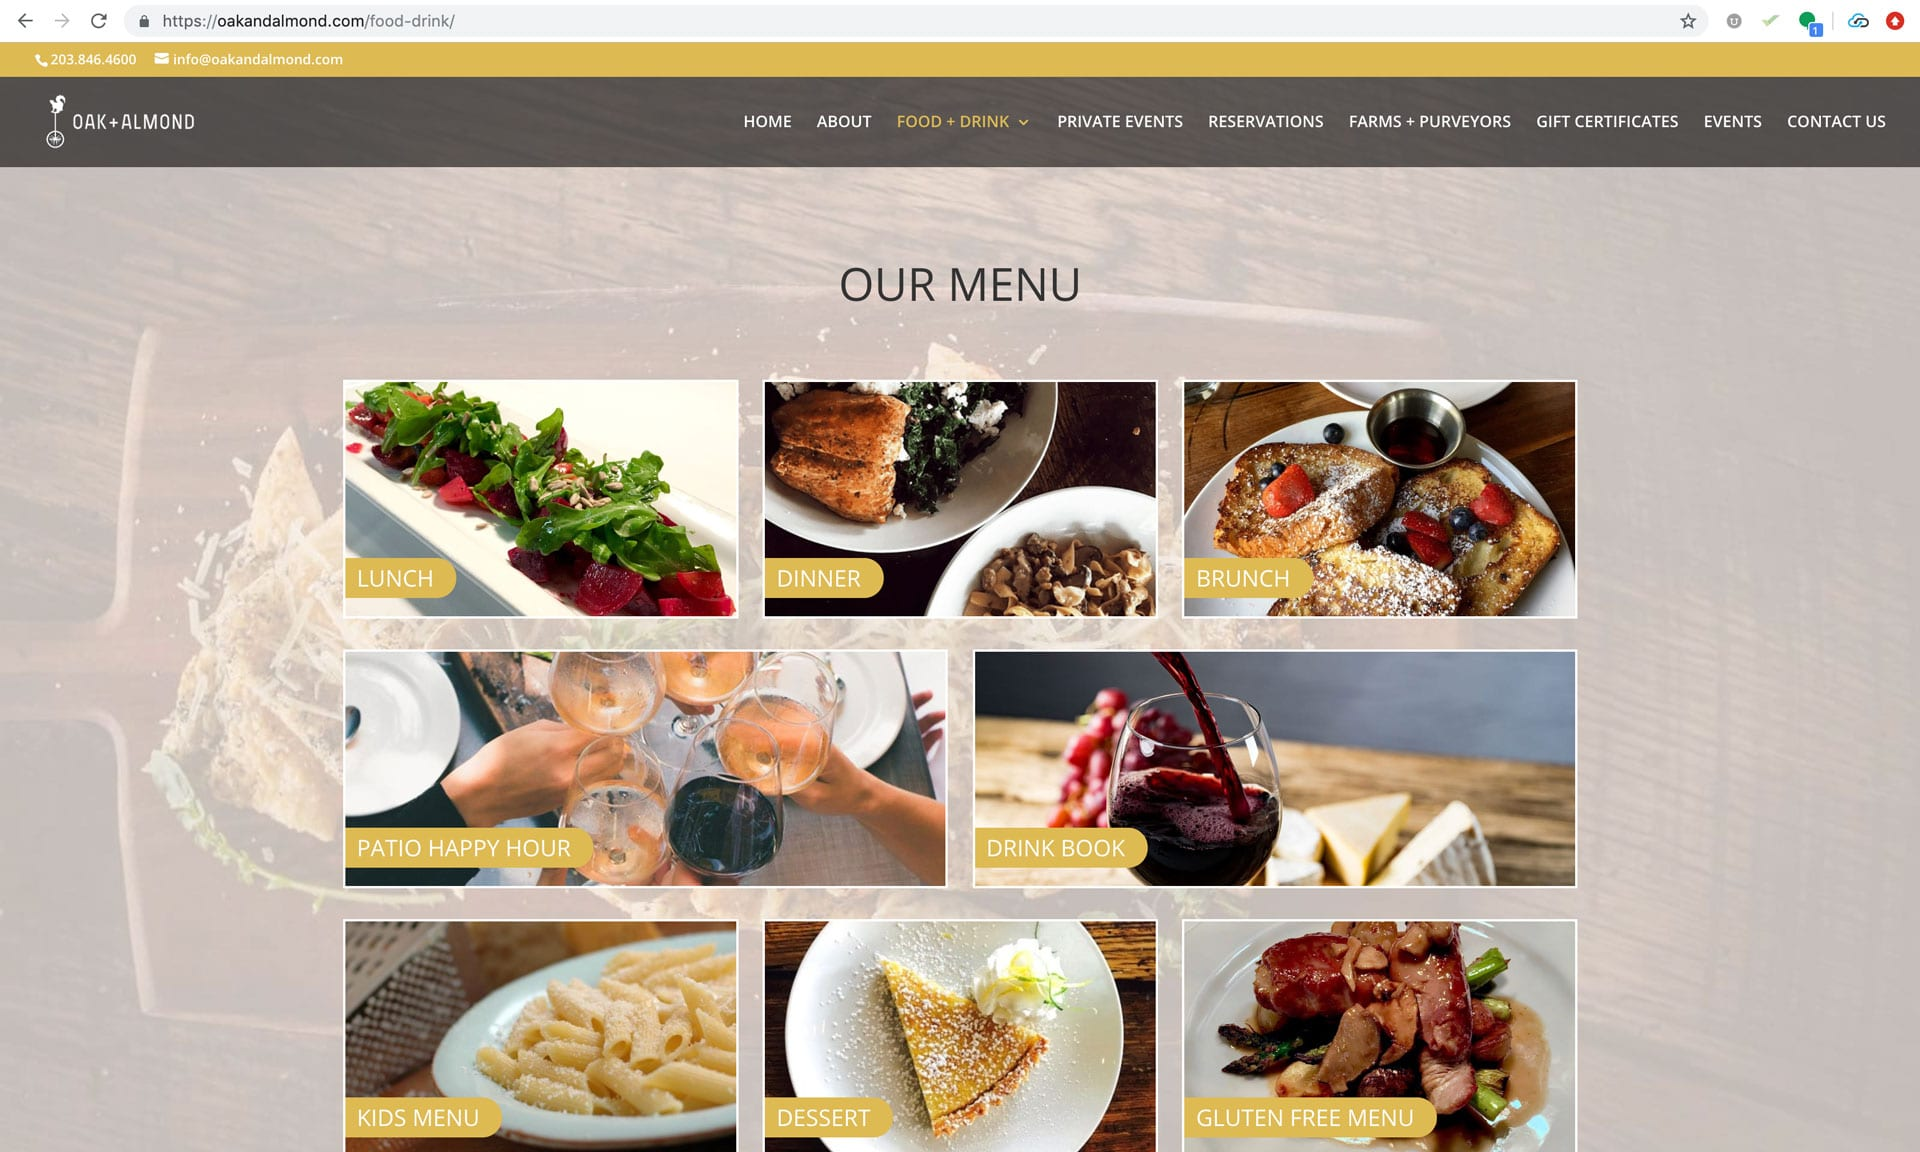 Oak and Almond New Menu Page - Website Design Wilton, CT Aspire Digital Solutions